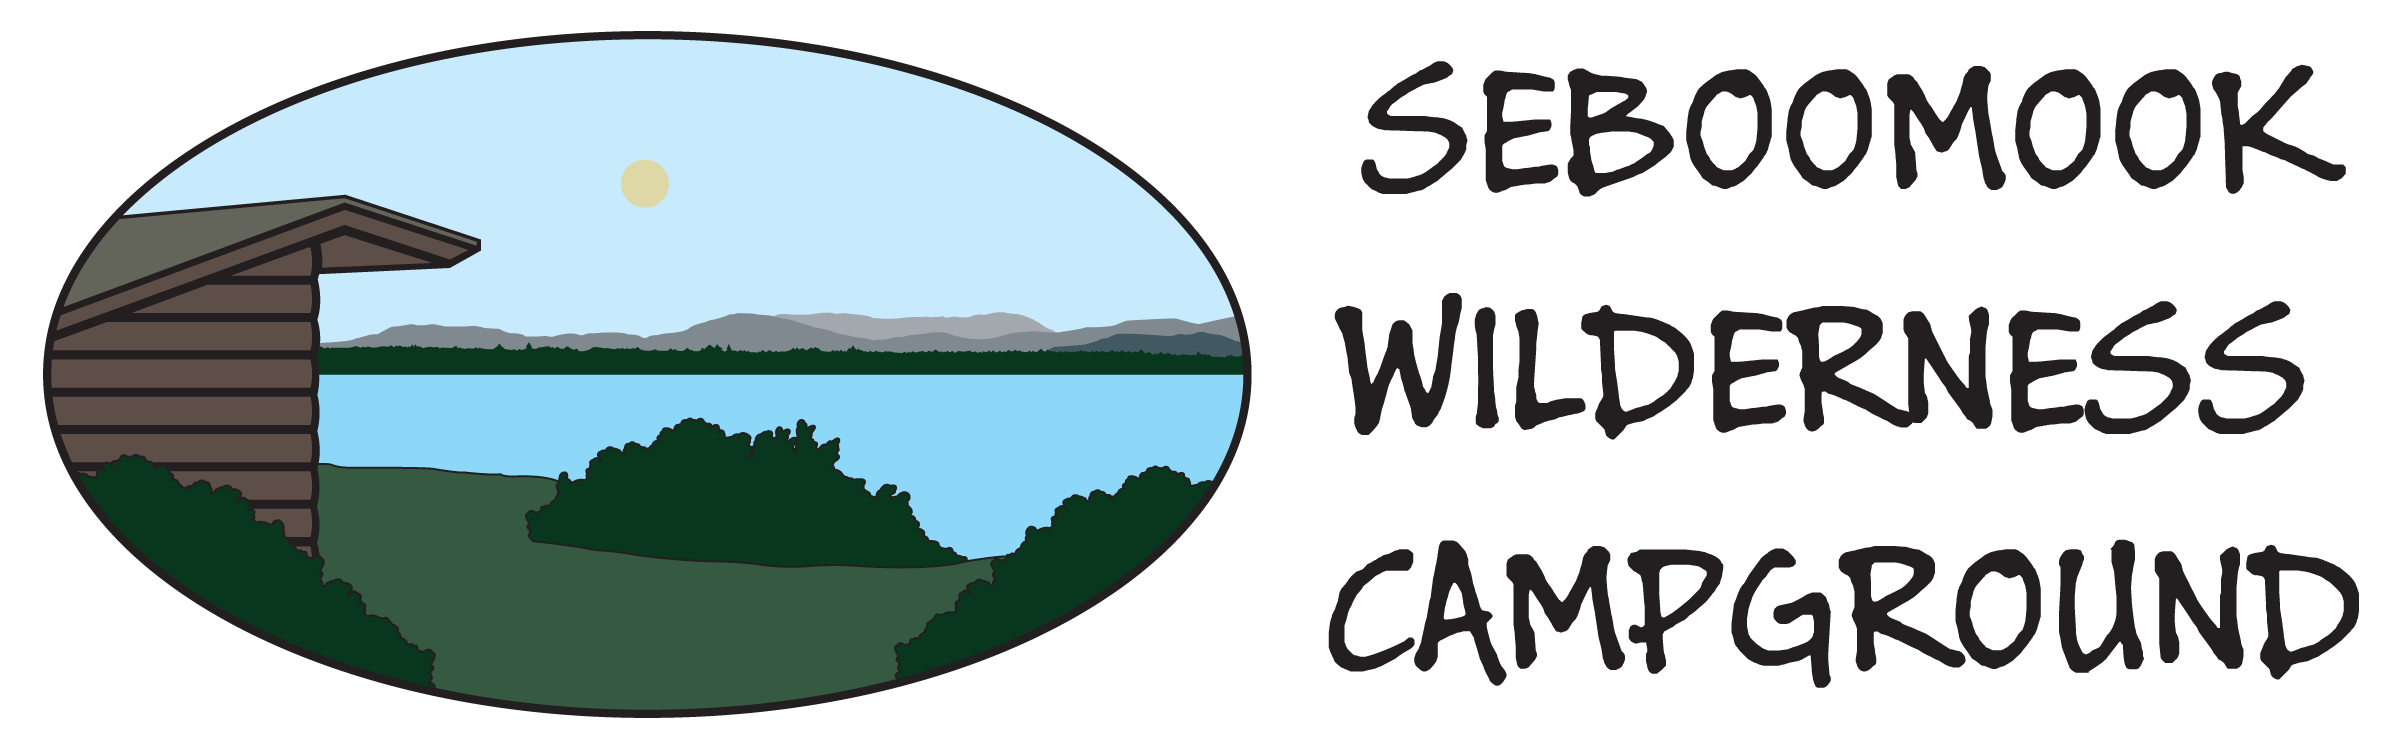 Lake clipart wilderness. Seboomook campground pricing